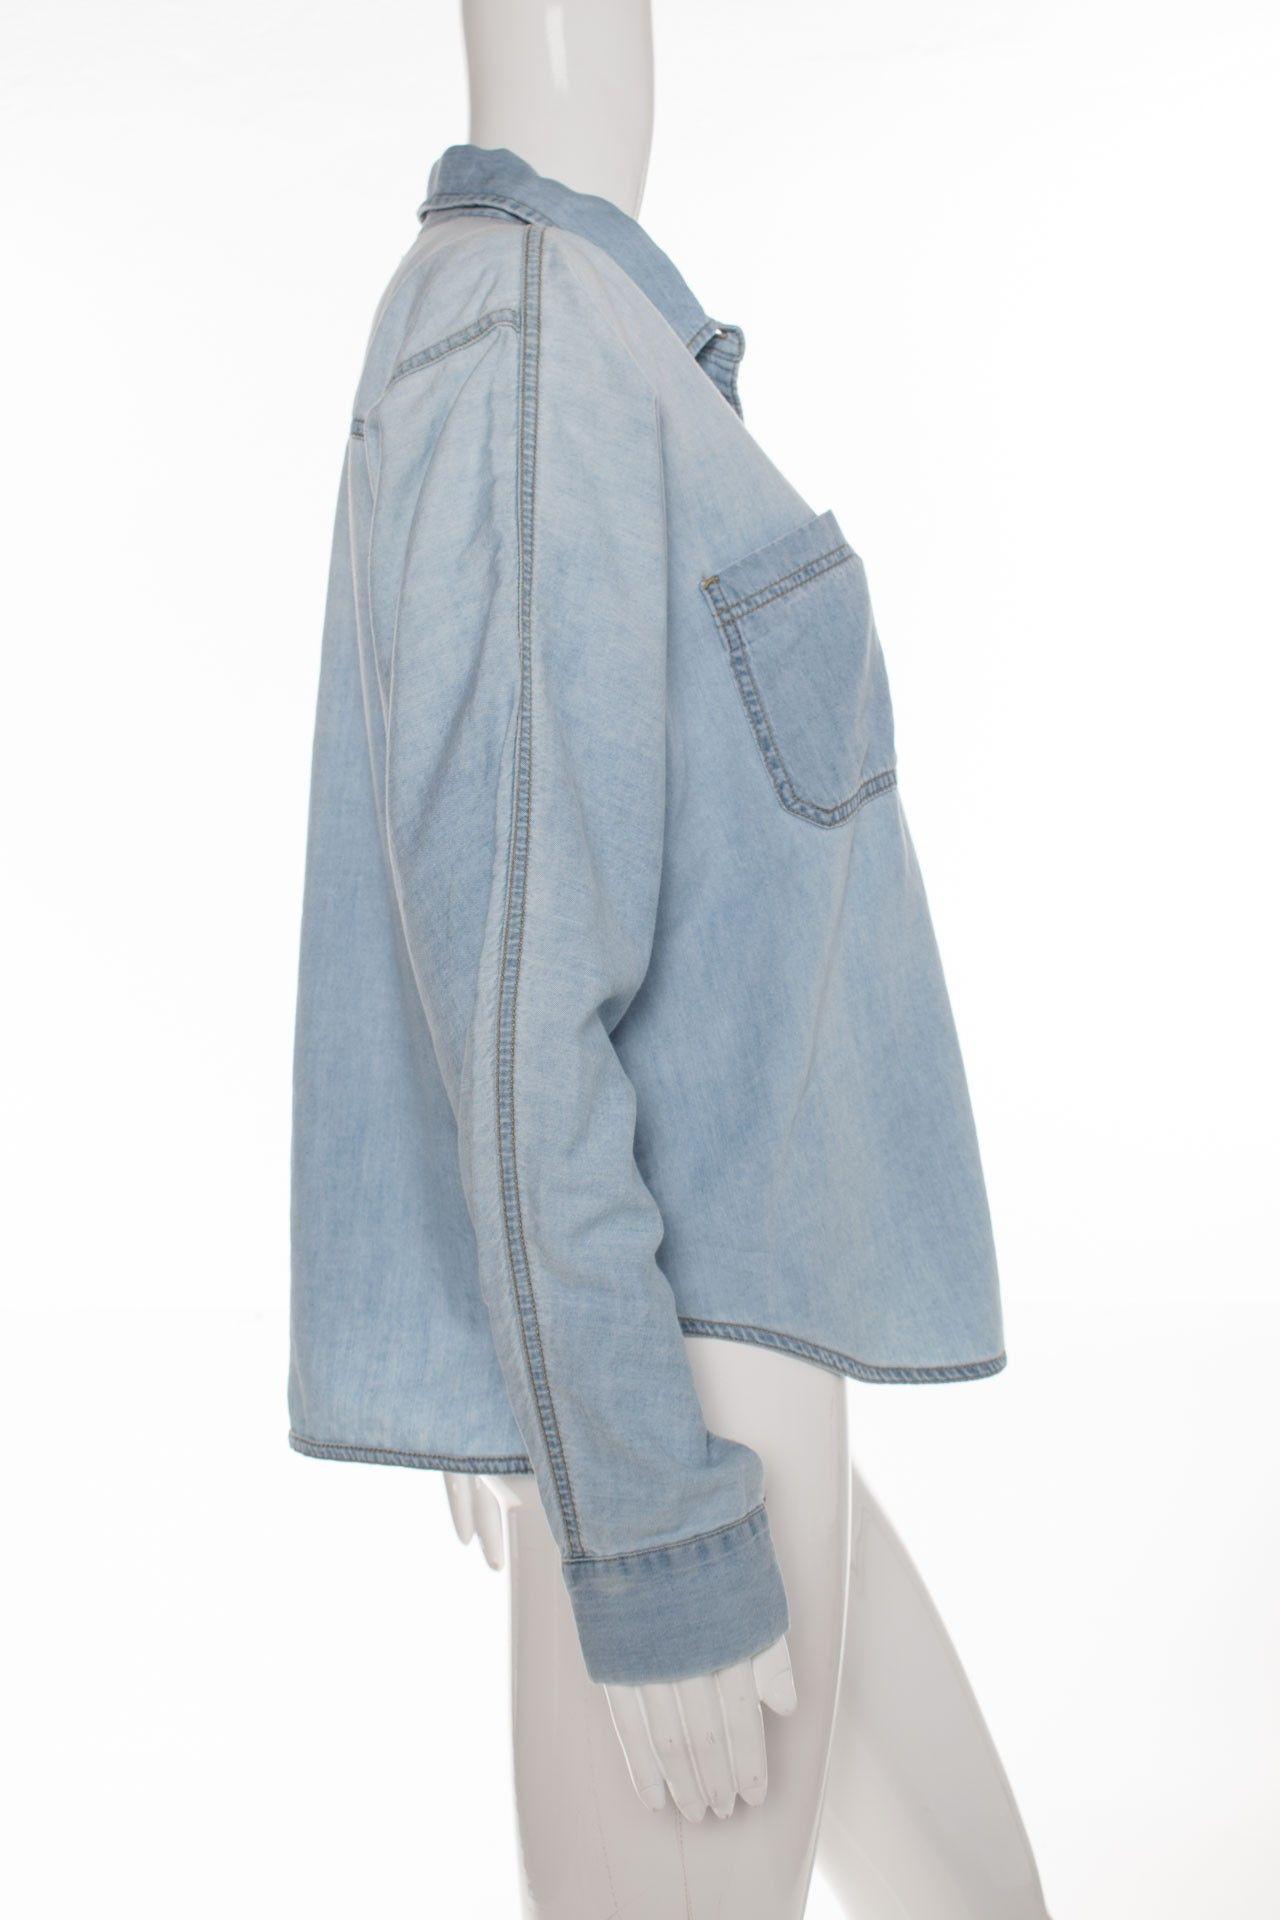 Topshop - Camisa Jeans - Foto 3